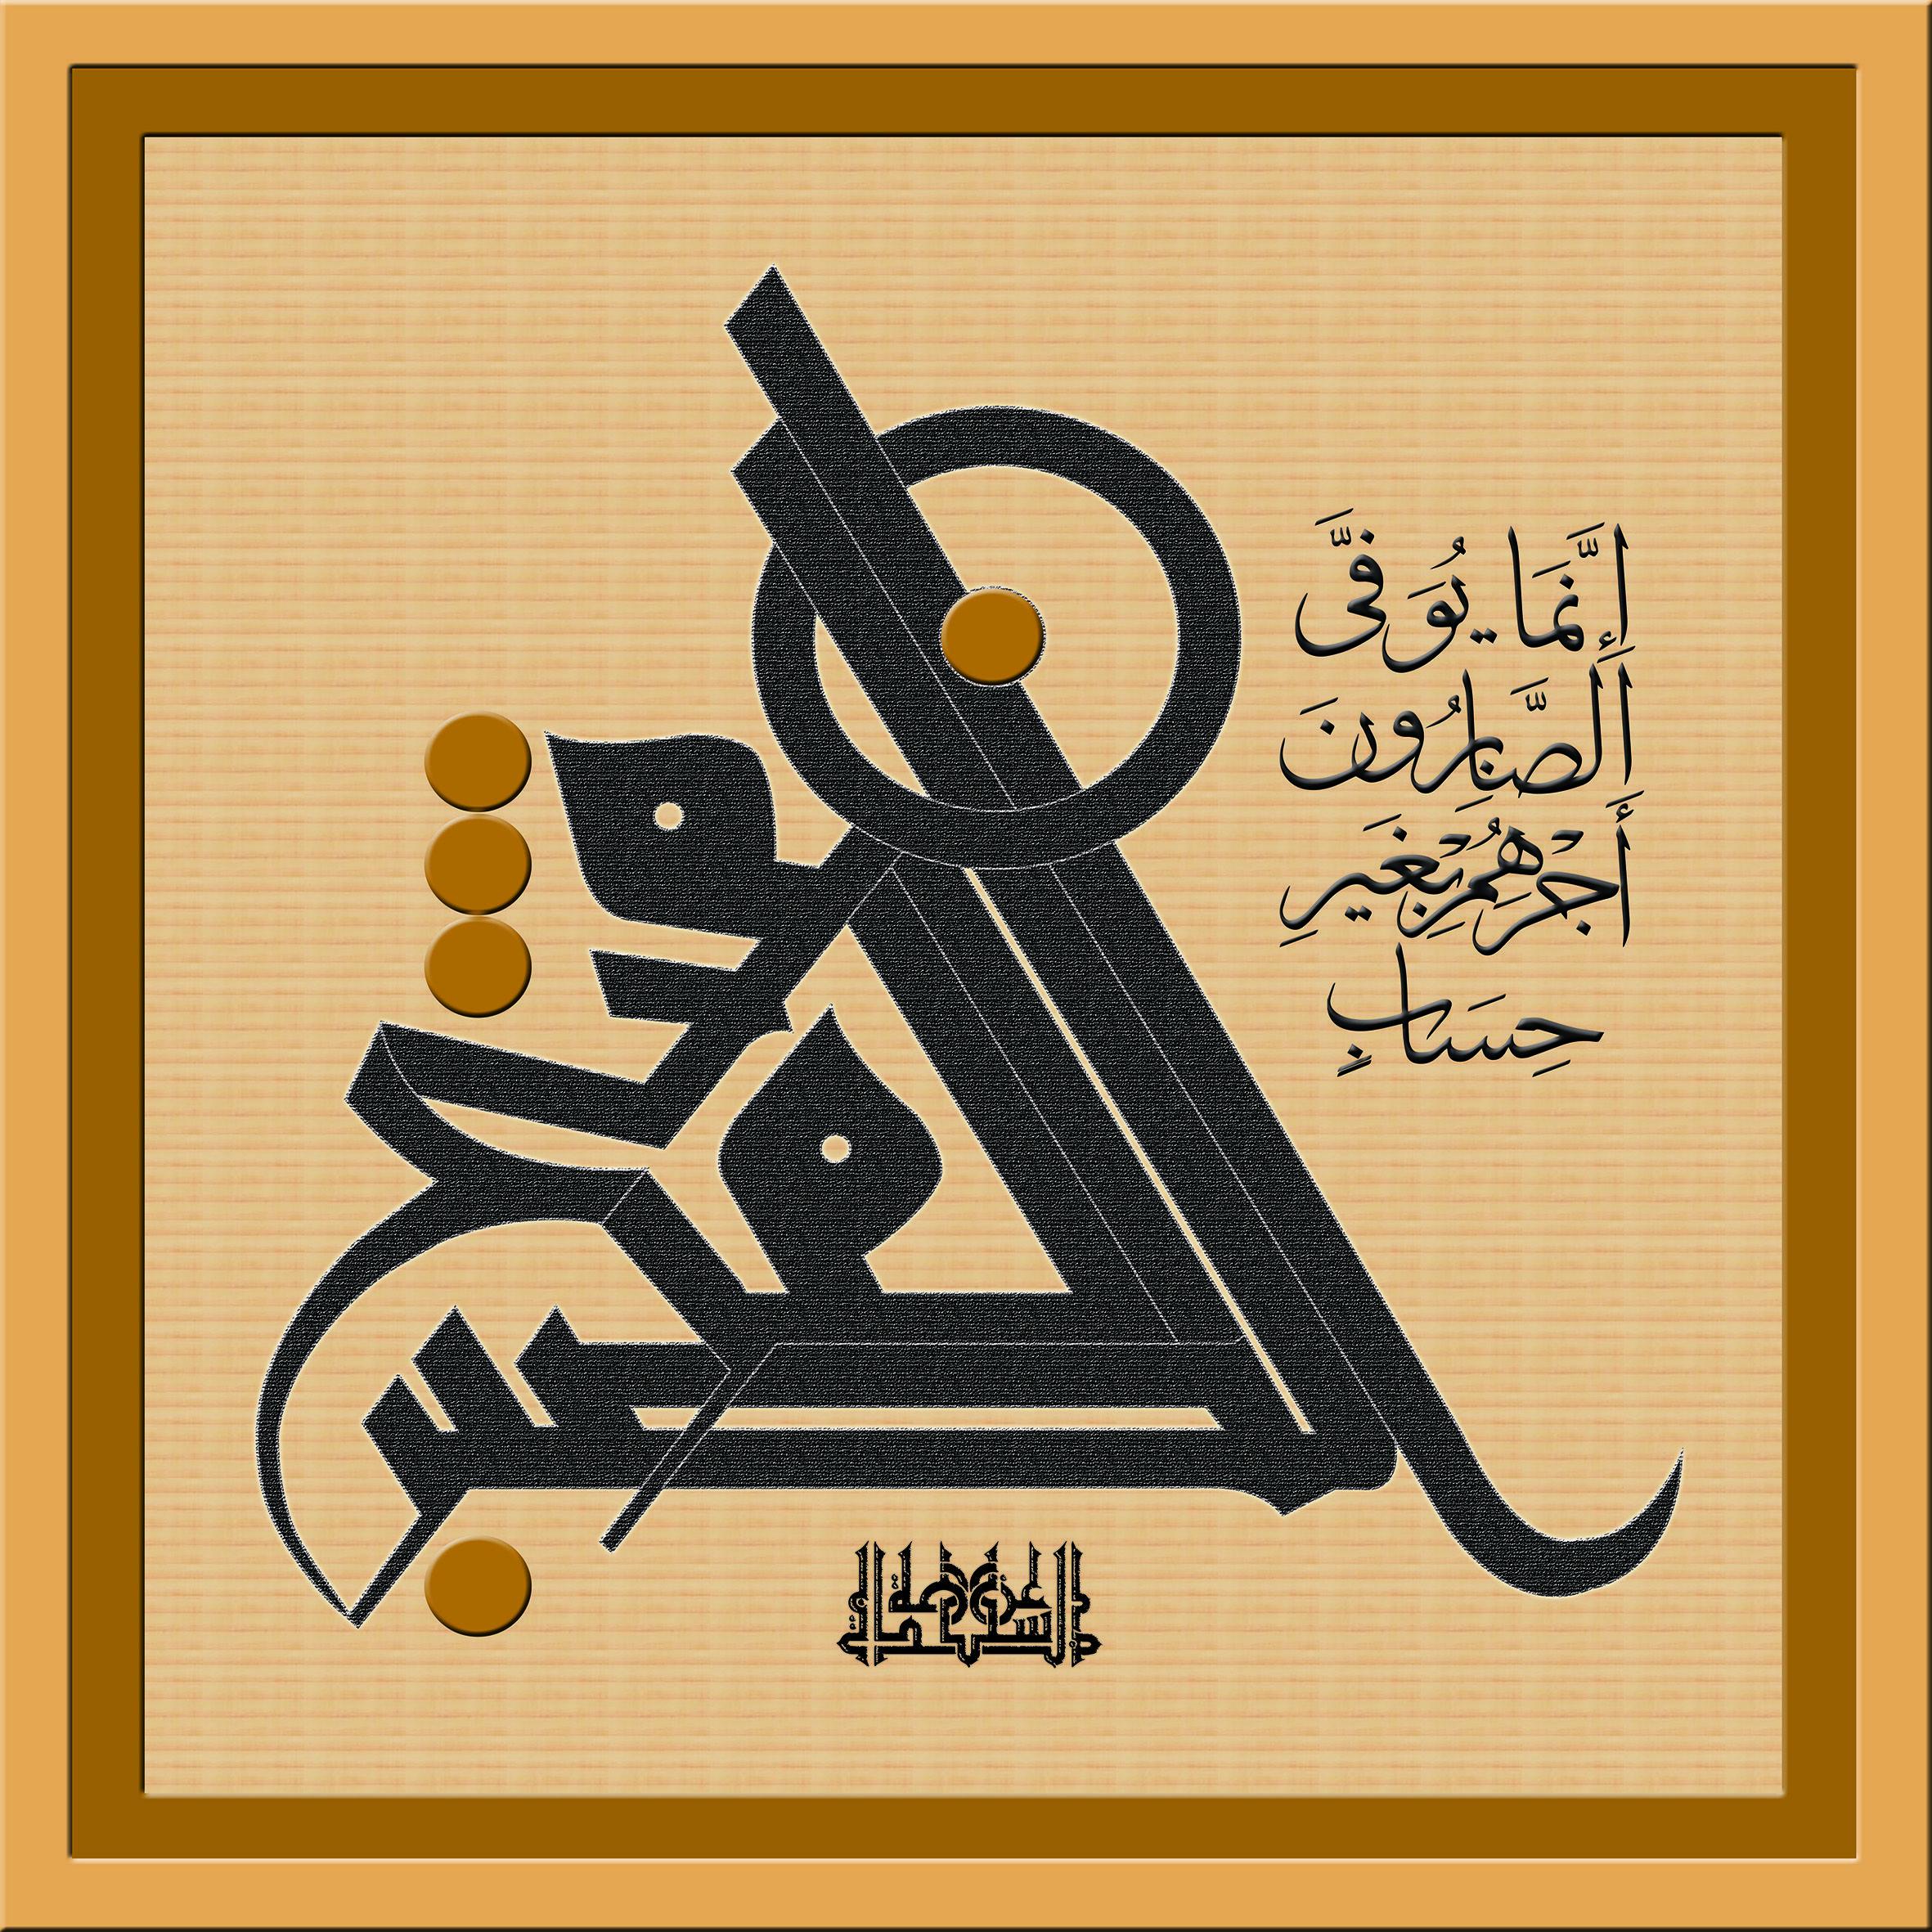 الصبر الصبر ثم الصبر الصبر مفتاح الفرج Spiritual Words Islamic Quotes Inspirational Words